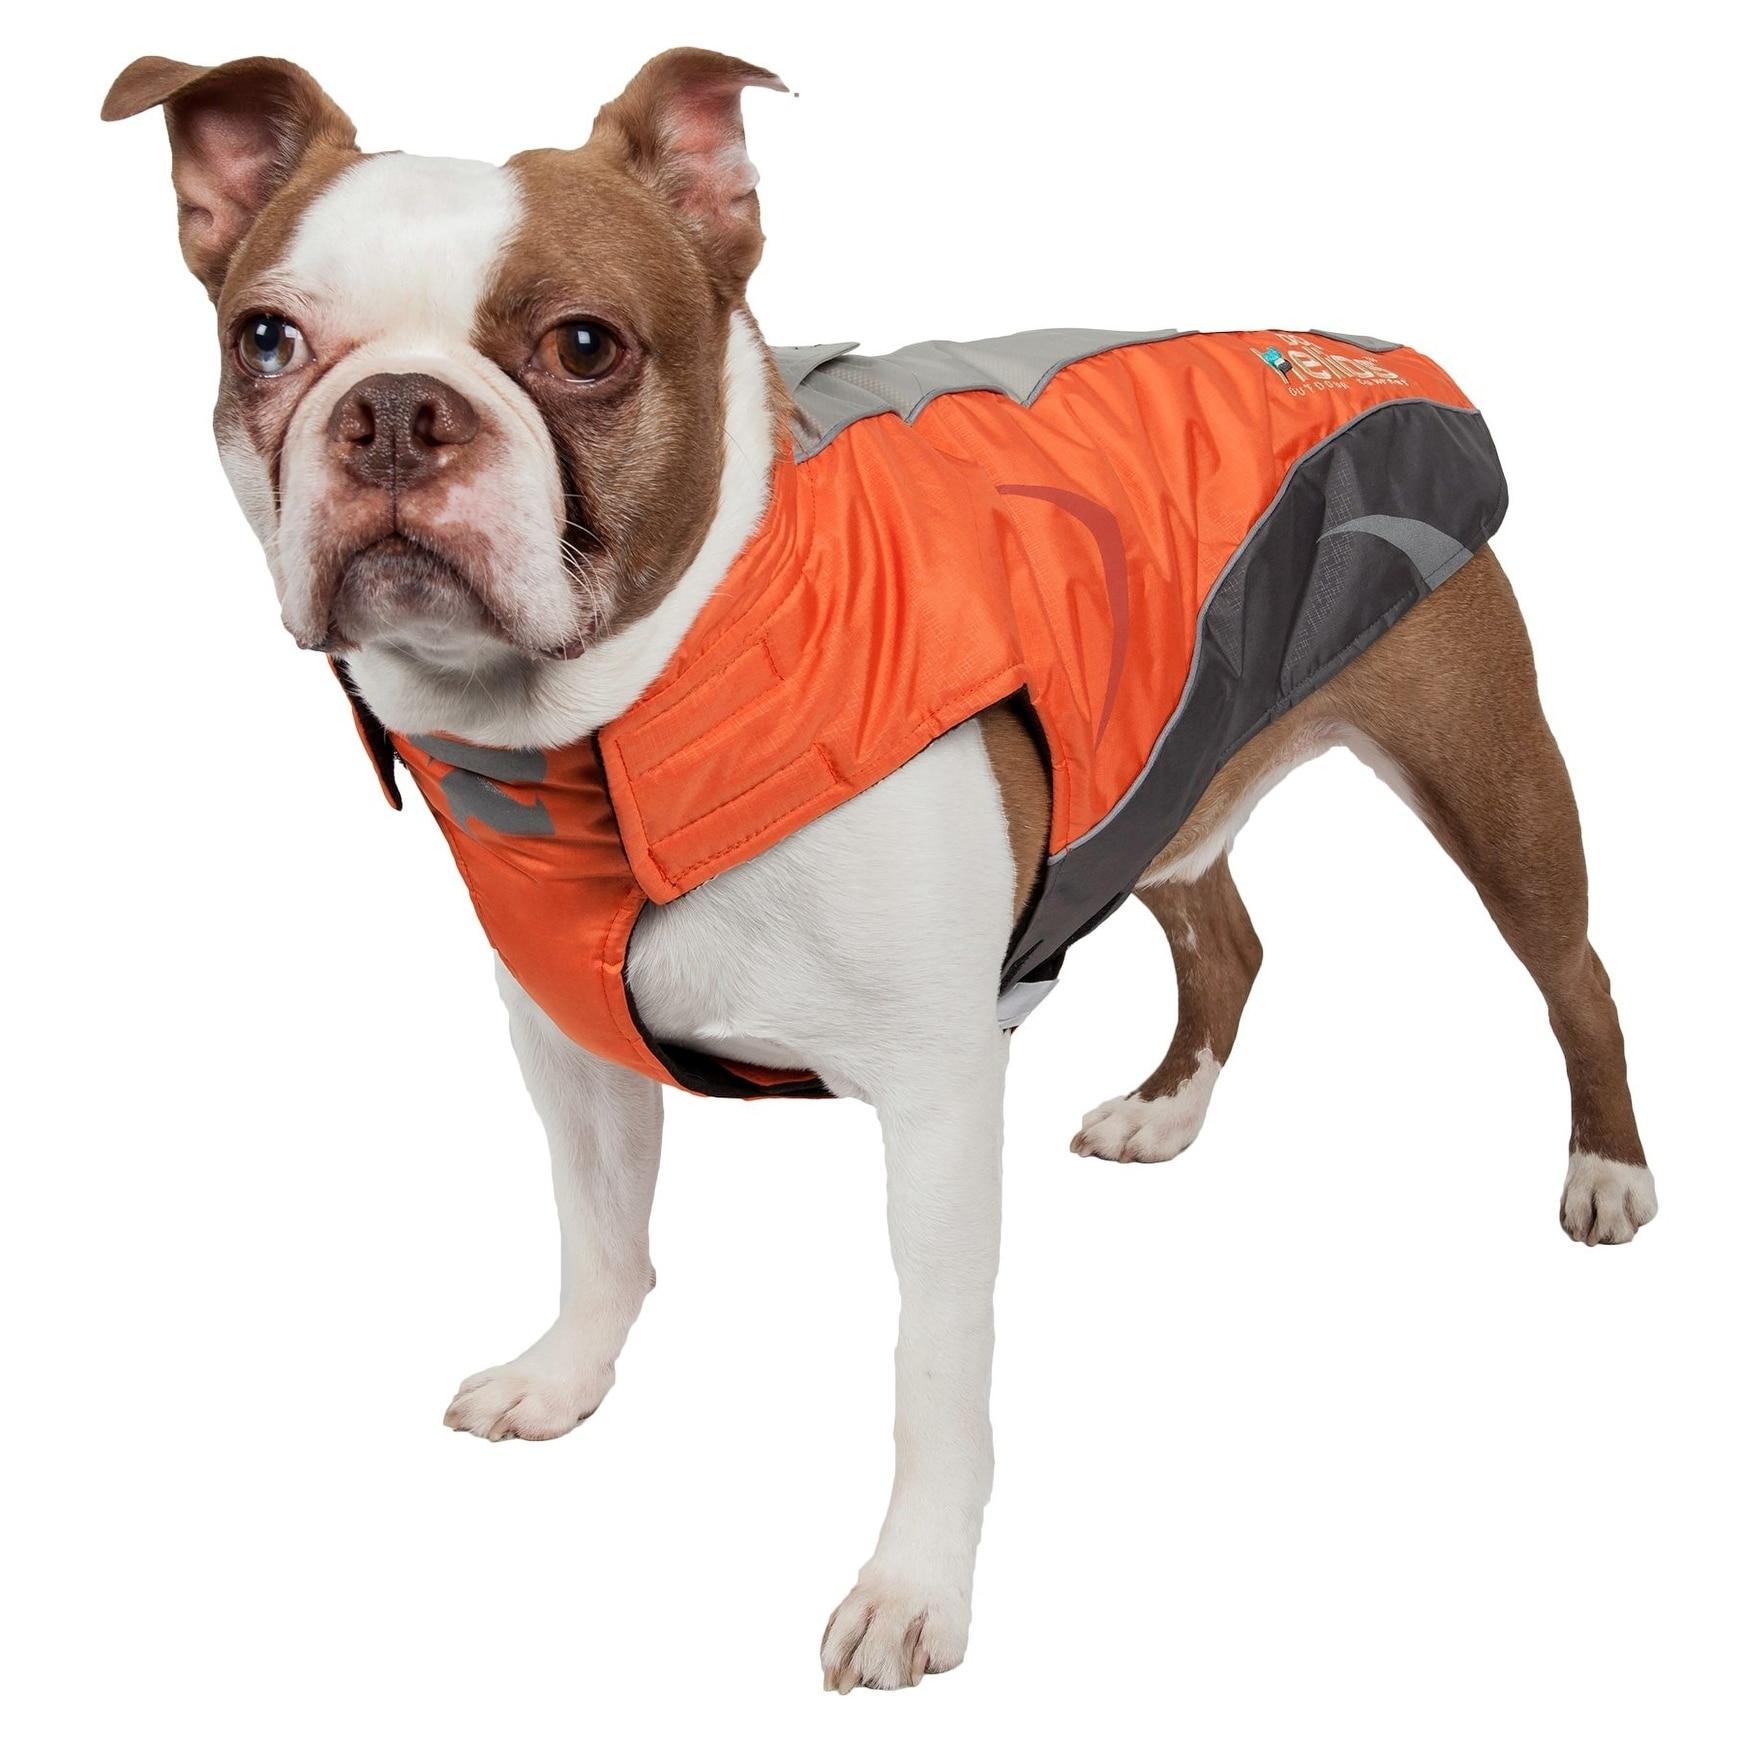 Helios Altitude-mountaineer Wrap Protective Waterproof Do...